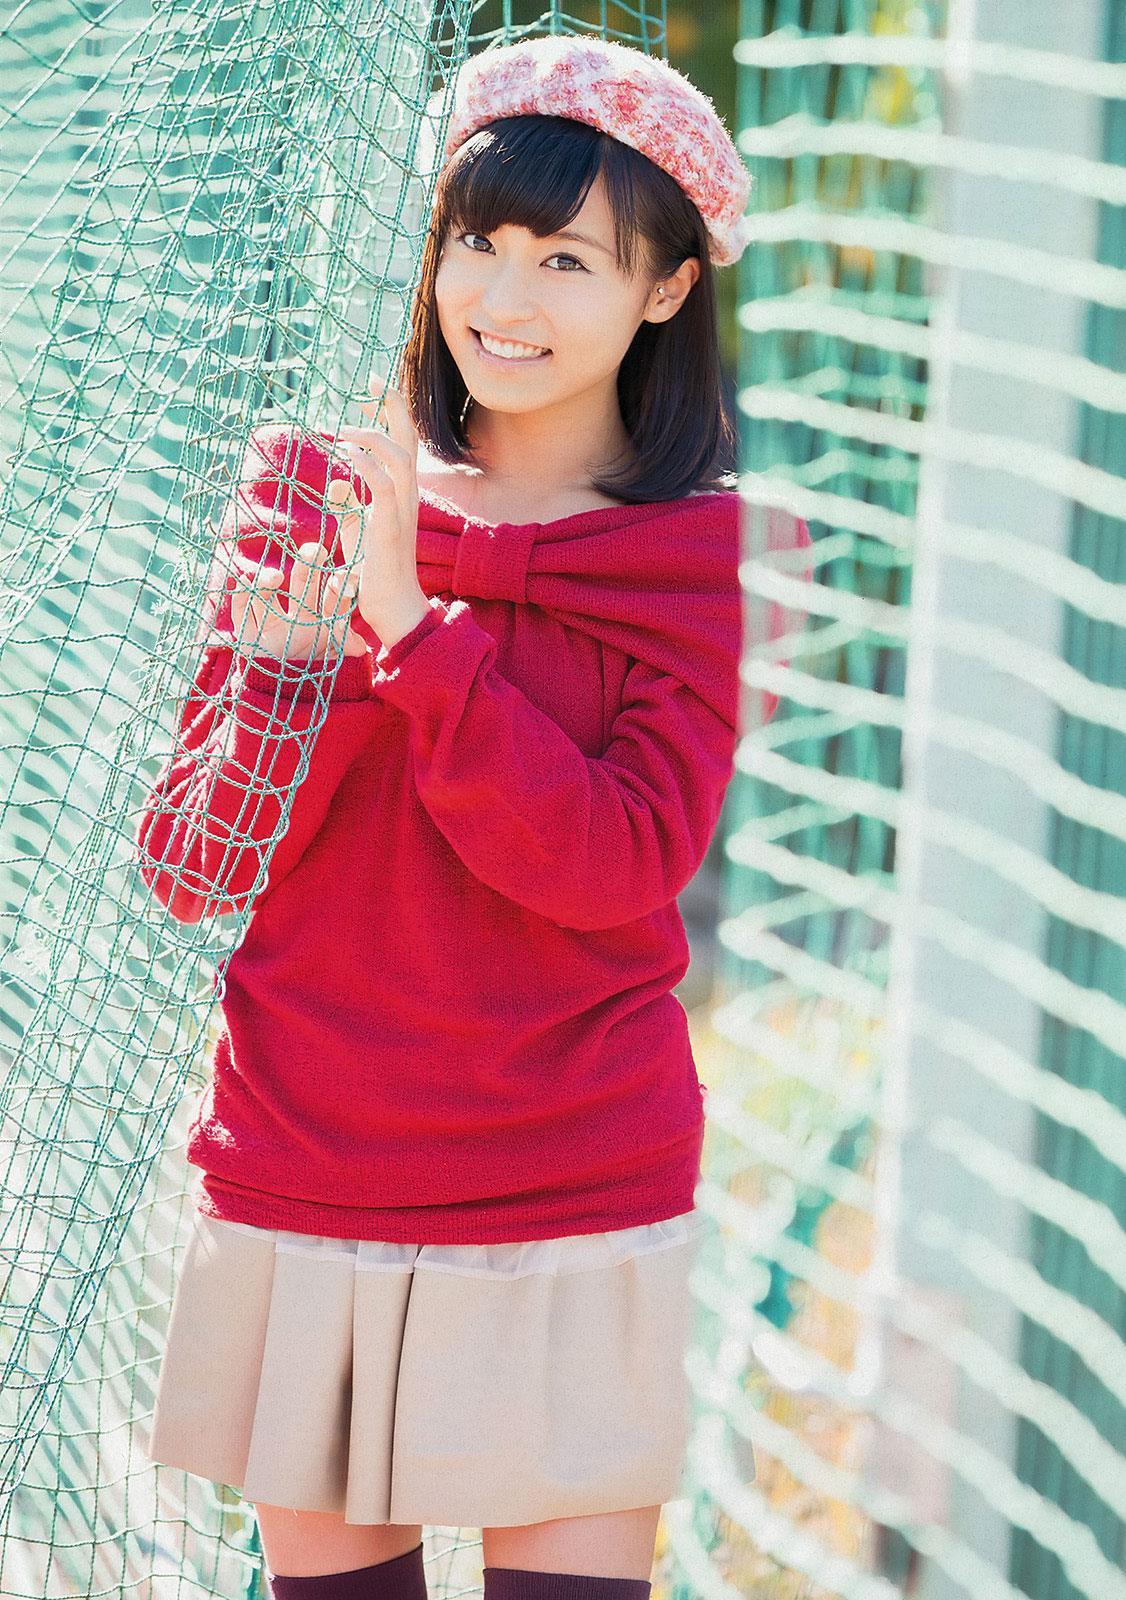 小島瑠璃子 画像 61